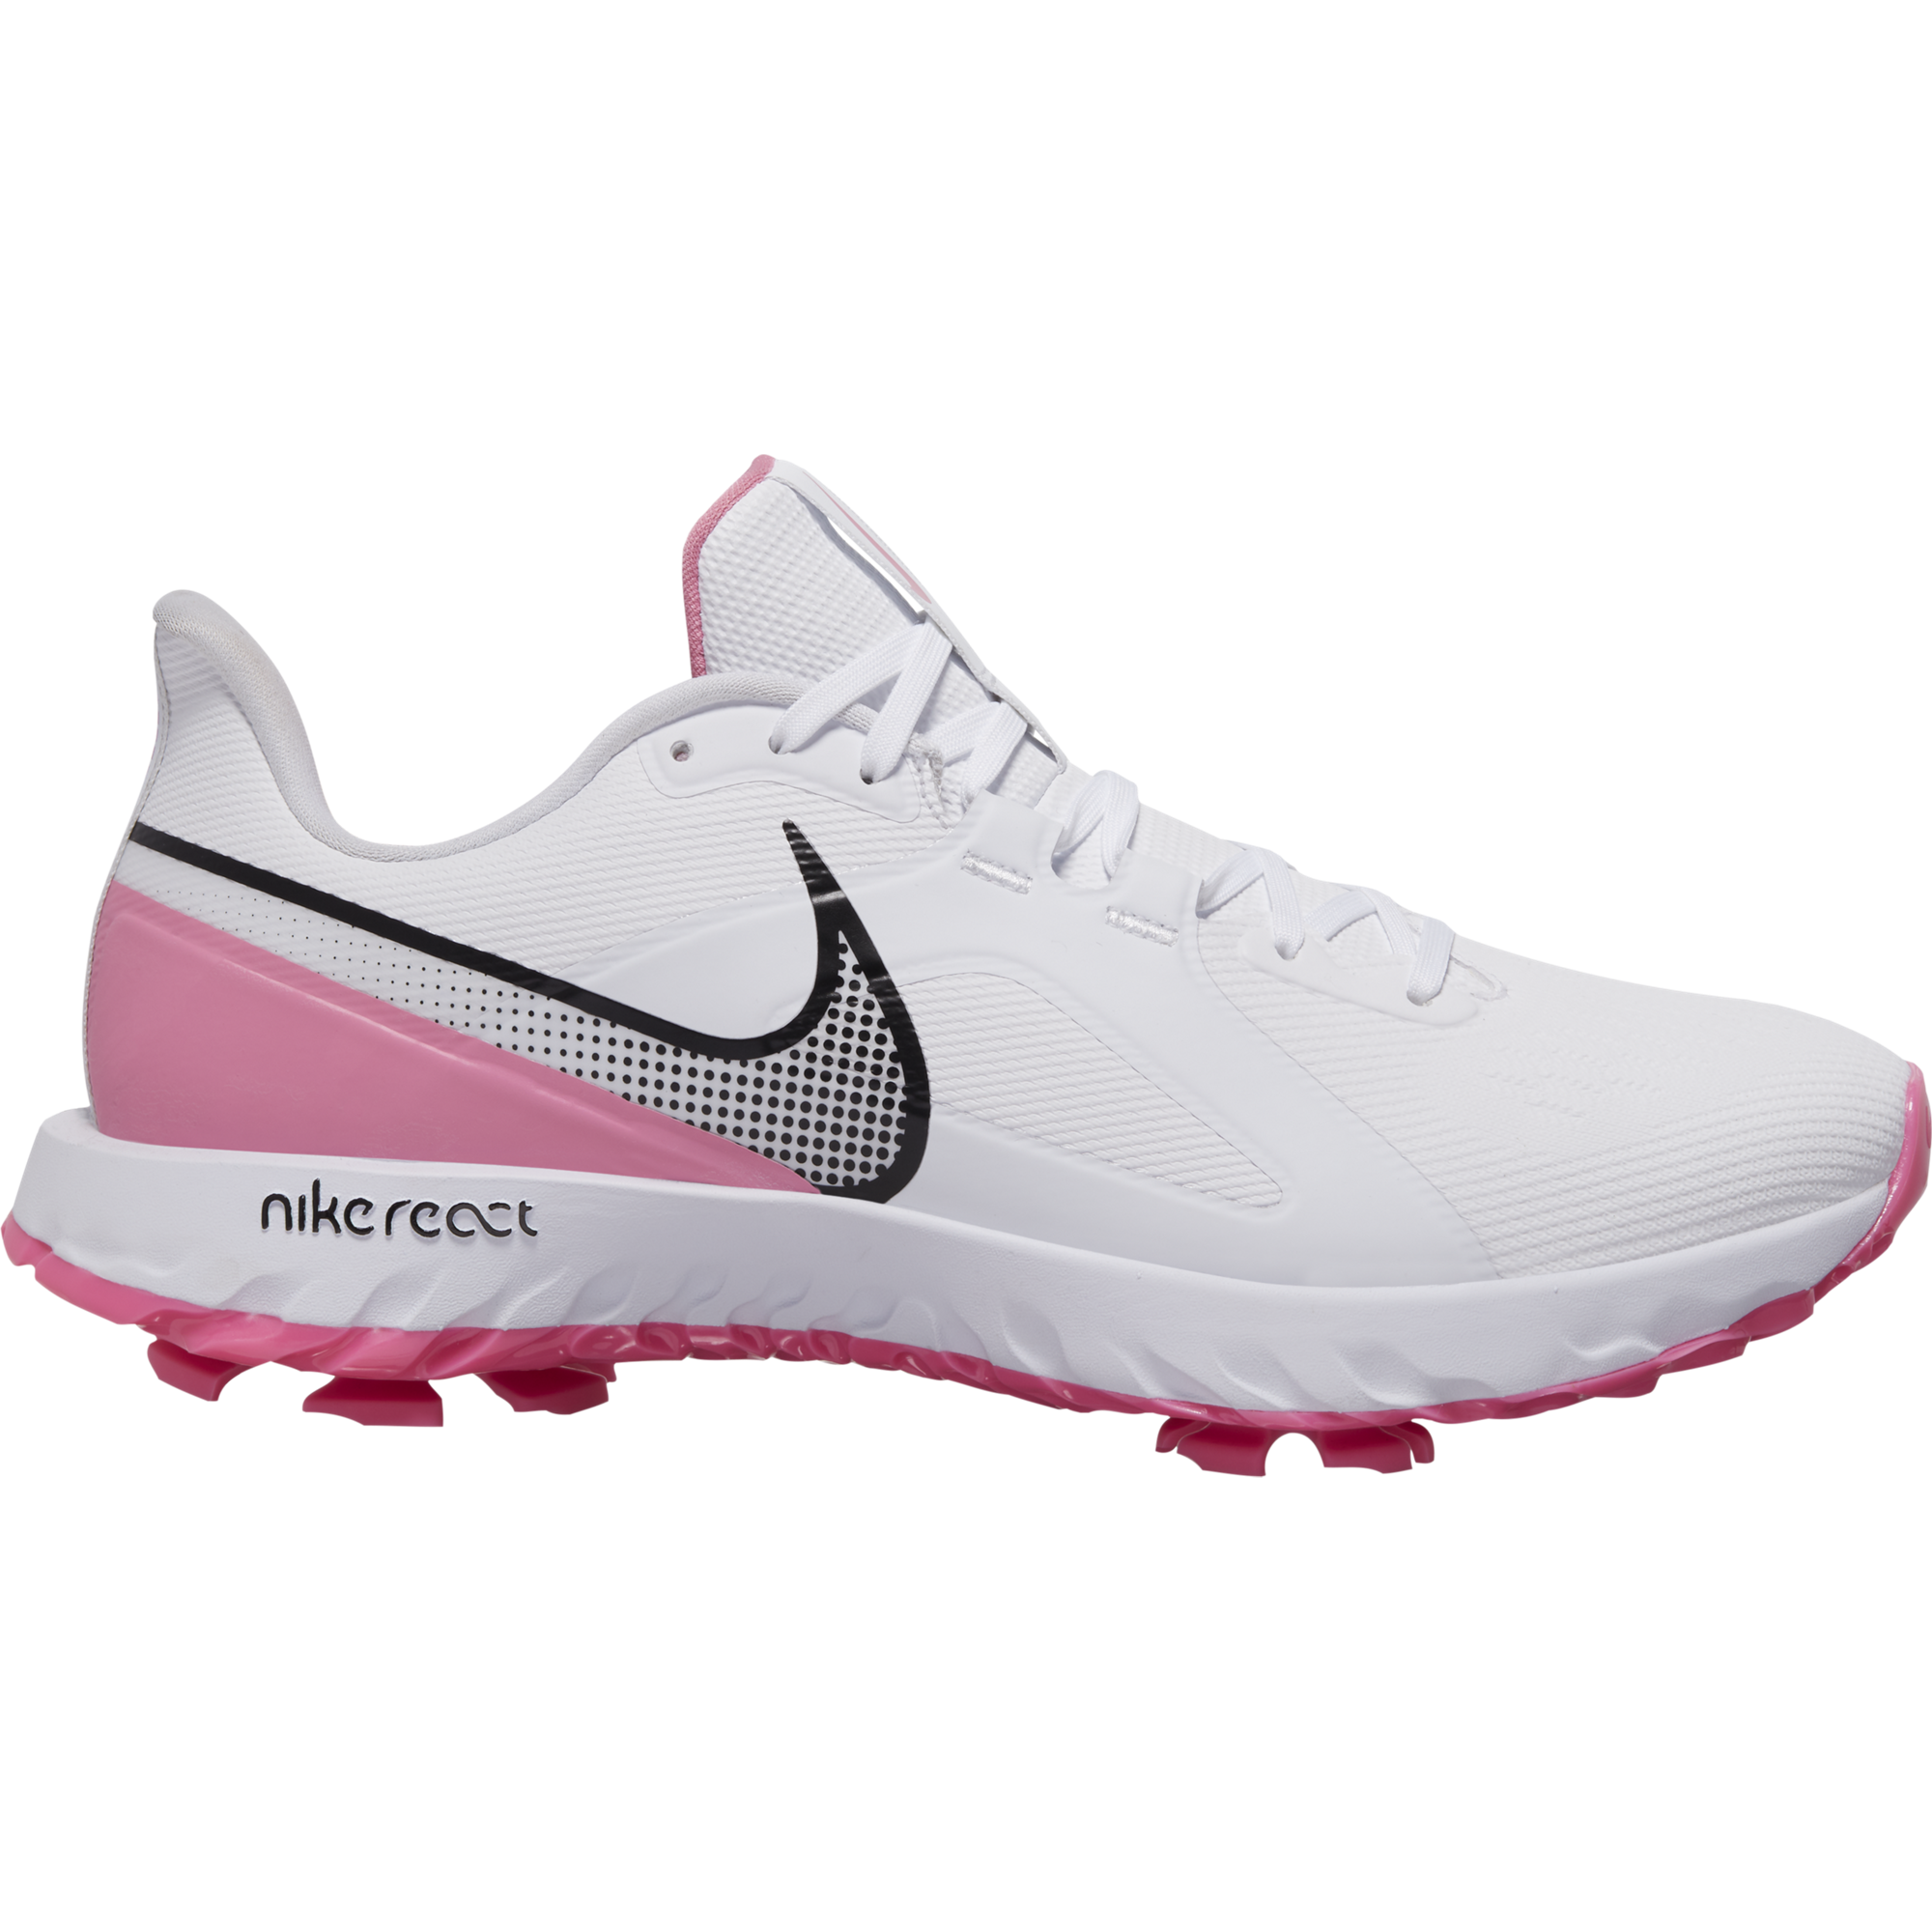 React Infinity Pro Men's Golf Shoe - White/Pink